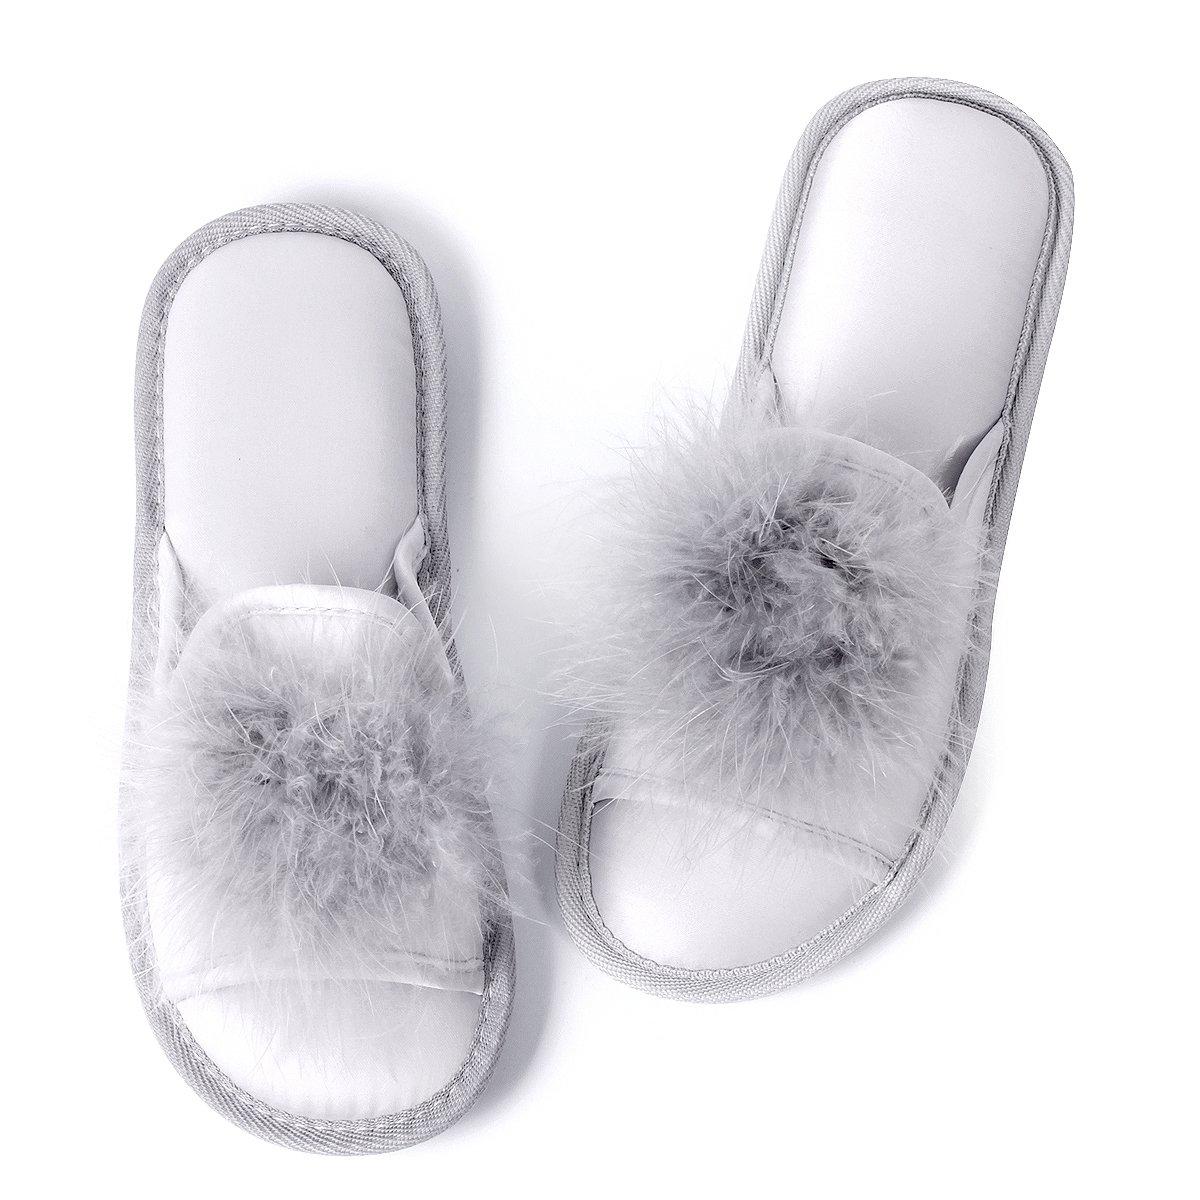 Women Open Toe Slippers| Pom Pom Fur Slippers | House Slide Clog| SliponIndoor Outdoor Shoes | Memory Foam Anti-Slip Sole (8-9, Silver Pom) by Caramella Bubble (Image #1)